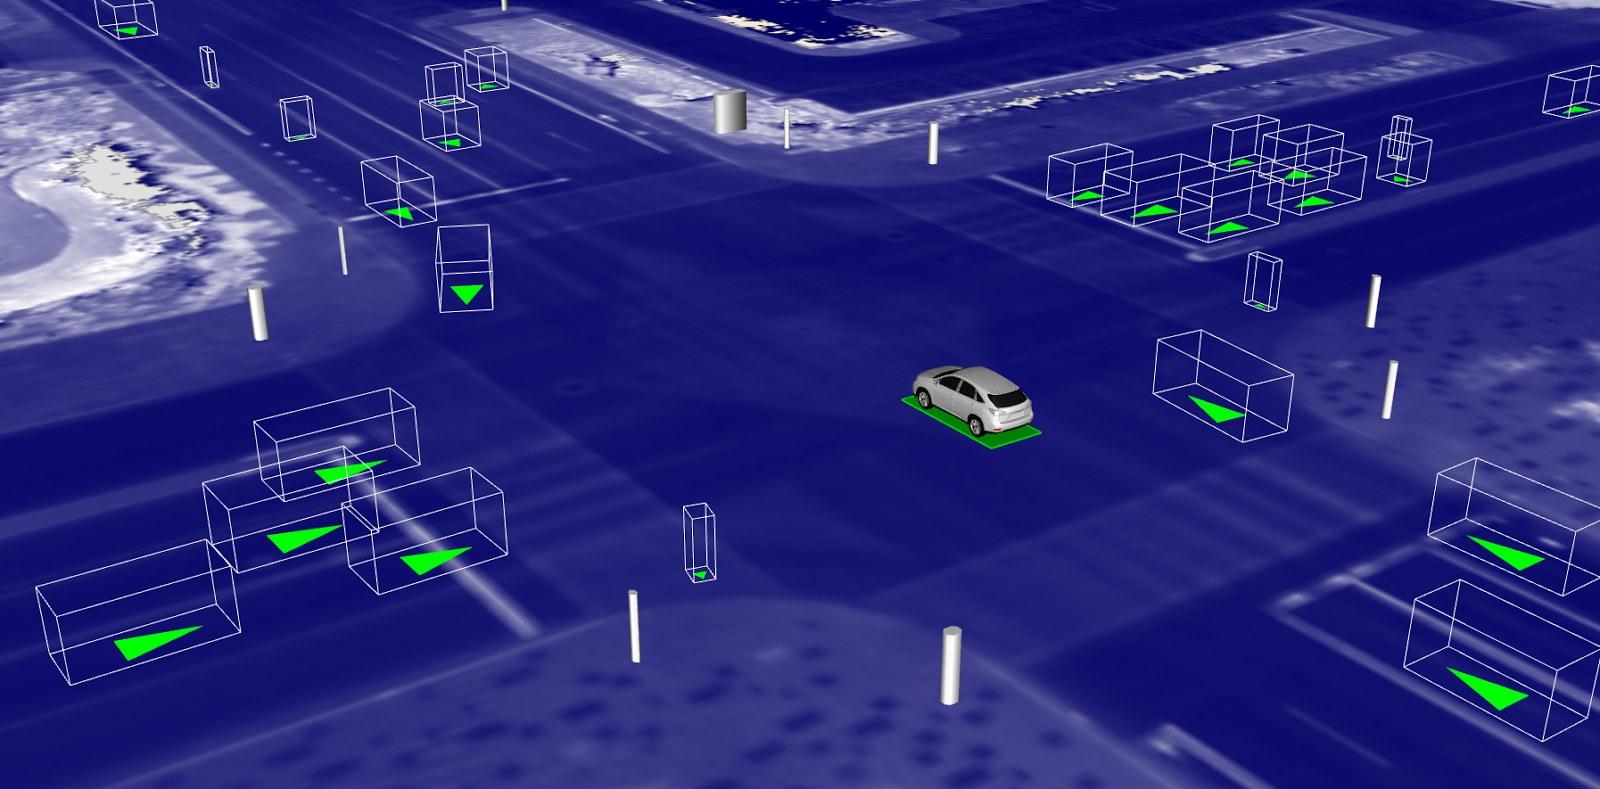 Waymo simulation is teaching self-driving cars invaluable skills | DeviceDaily.com